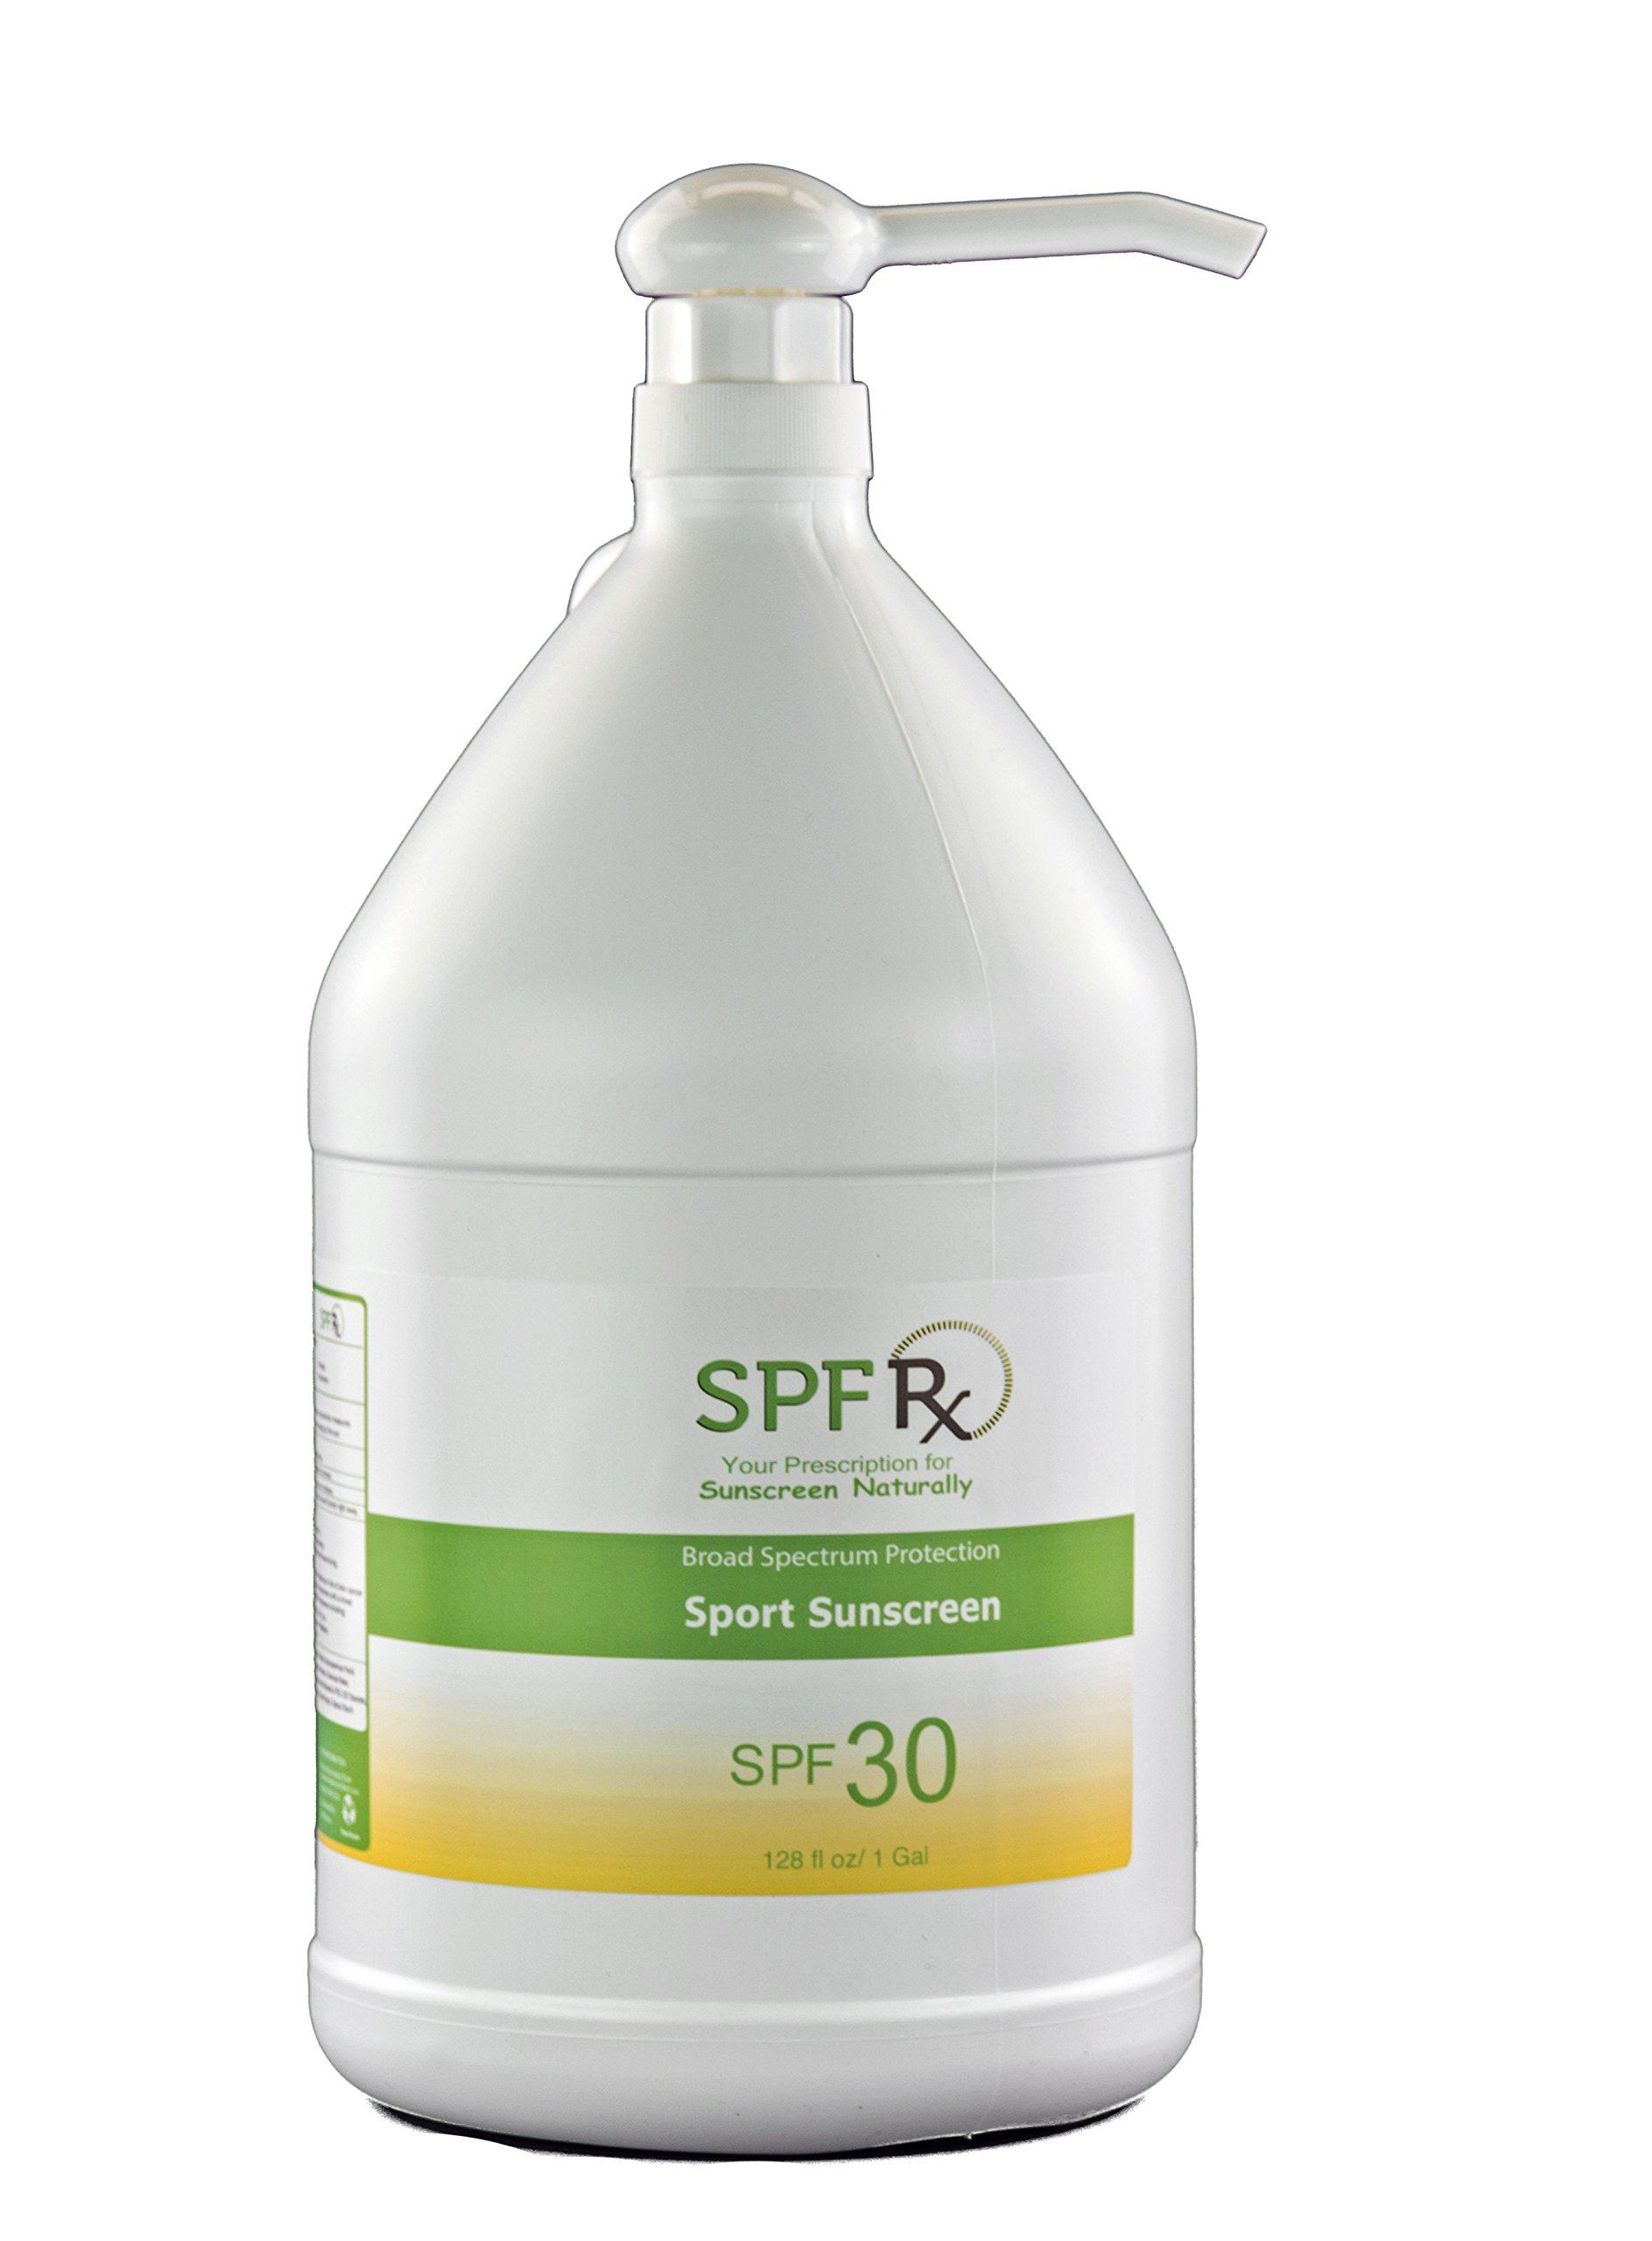 Broad Spectrum Protection Sport Sunscreen SPF 30 – Best For Golfing, Snowboarding, Gardening, Surfing - Sport Sunblock Decreases the risk Skin Cancer, Aging & Sunburn – Bulk for Face & Body (1 Gallon)